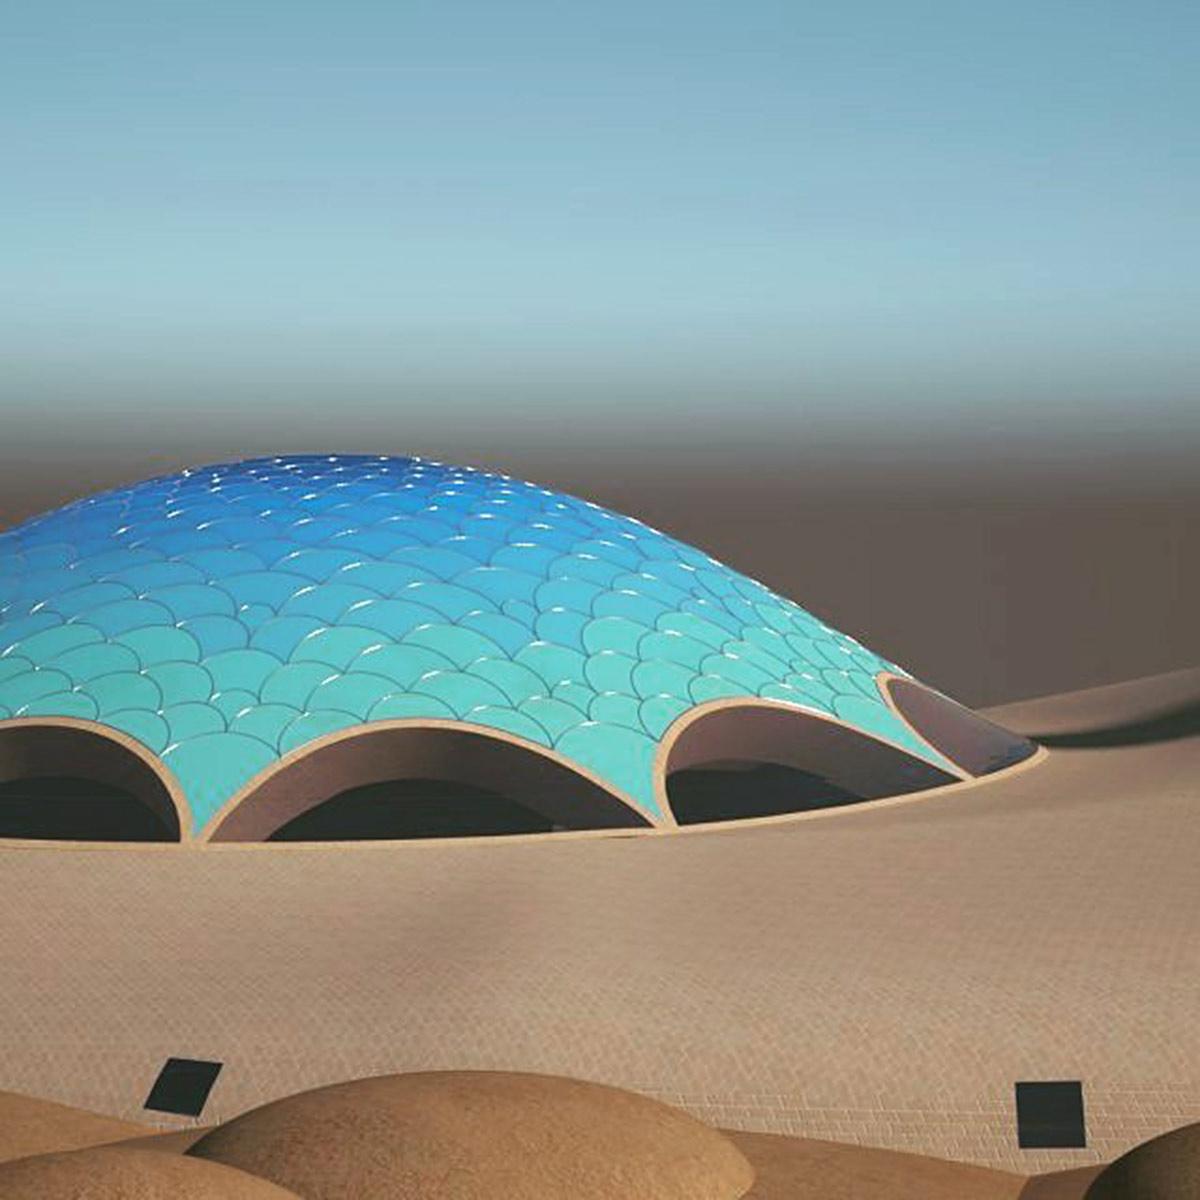 Sci-Fi Mosque